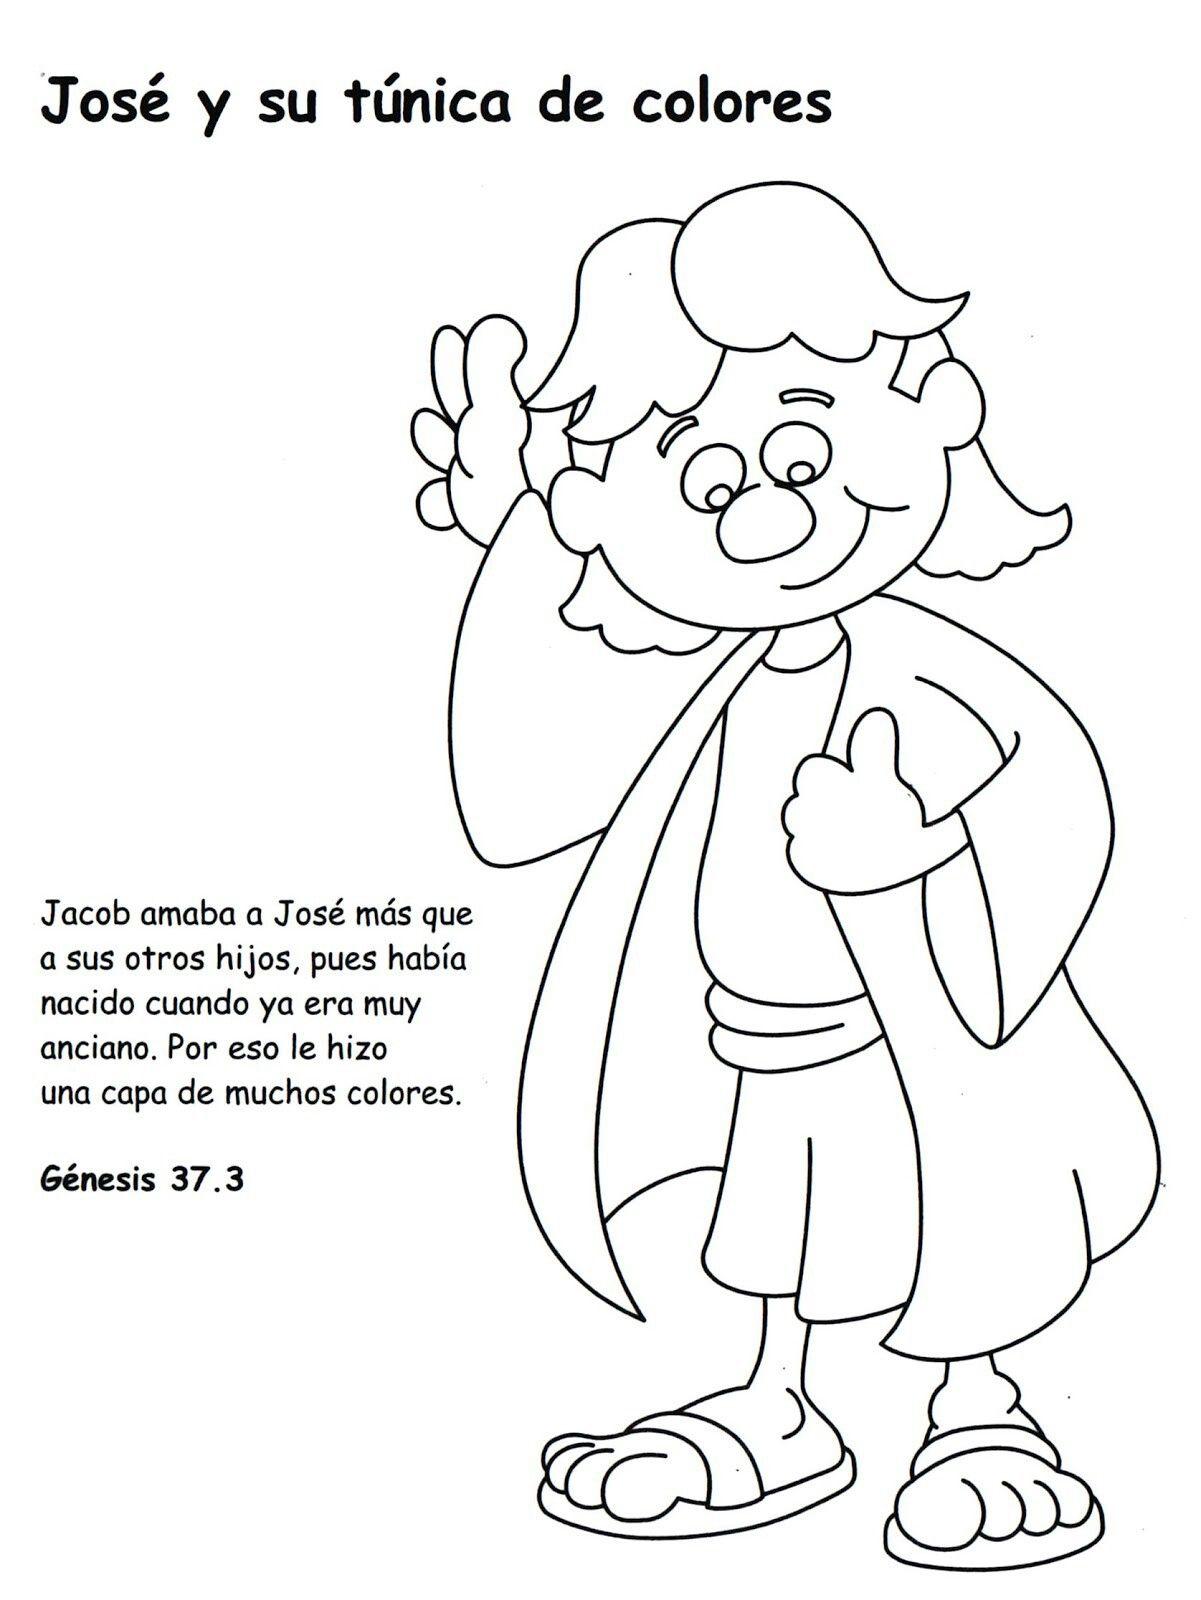 Pin de Dina Cerón en dibujos biblicos | Pinterest | Dibujo